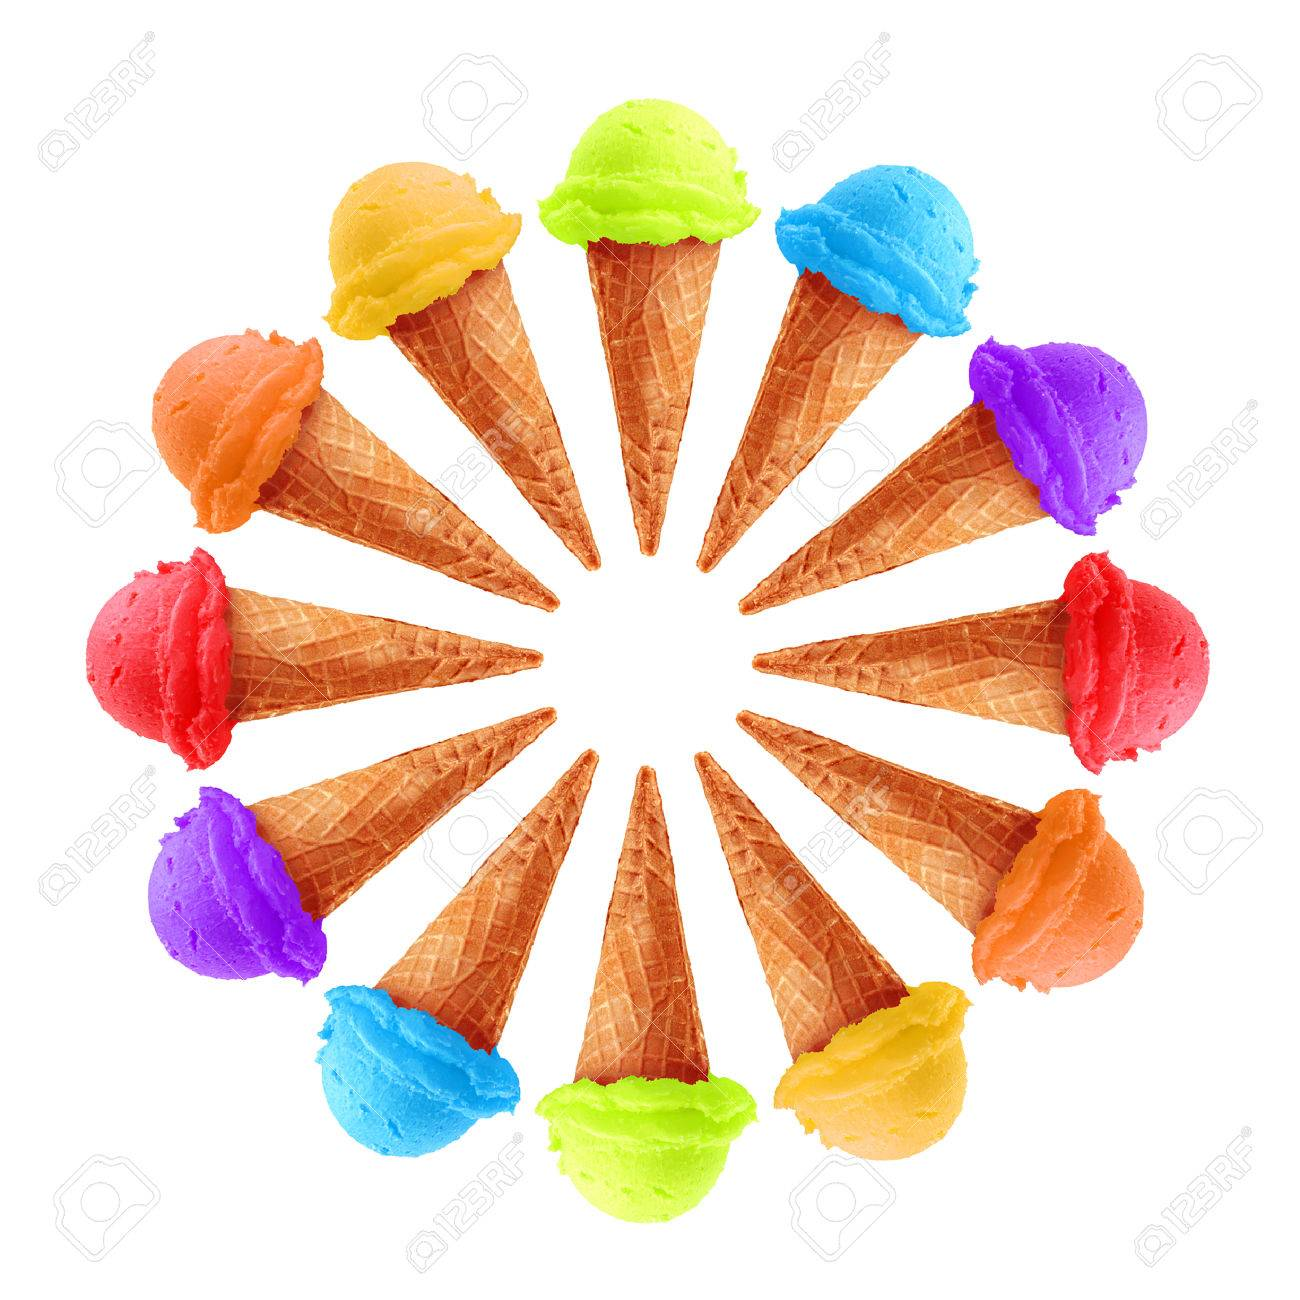 Circle of ice cream in rainbow colors. - 51338982